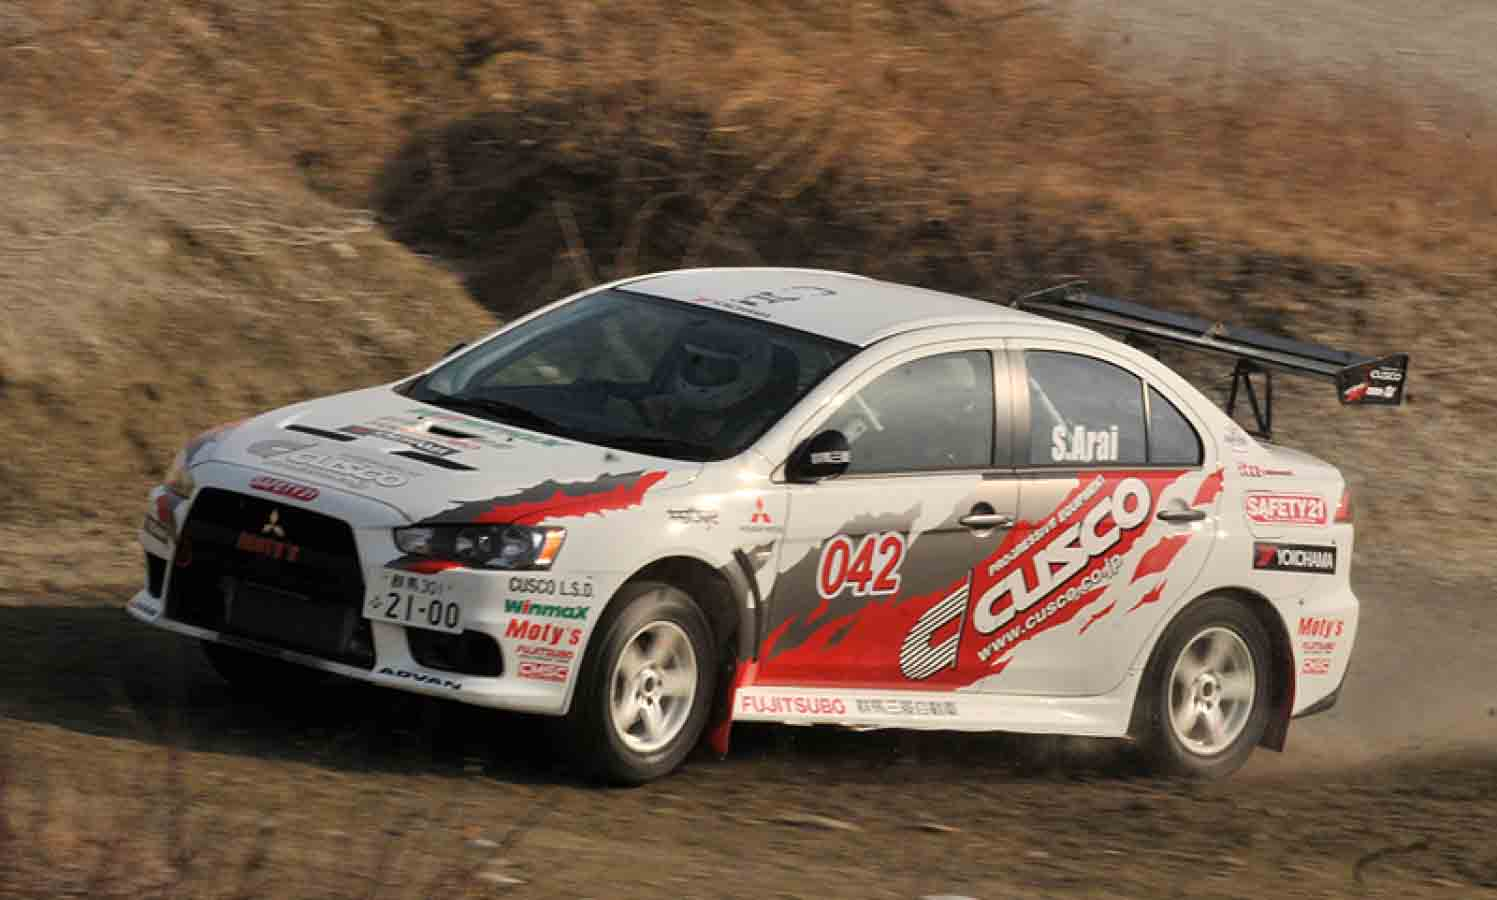 cusco-competition-zero-3g-gravel-car.jpg